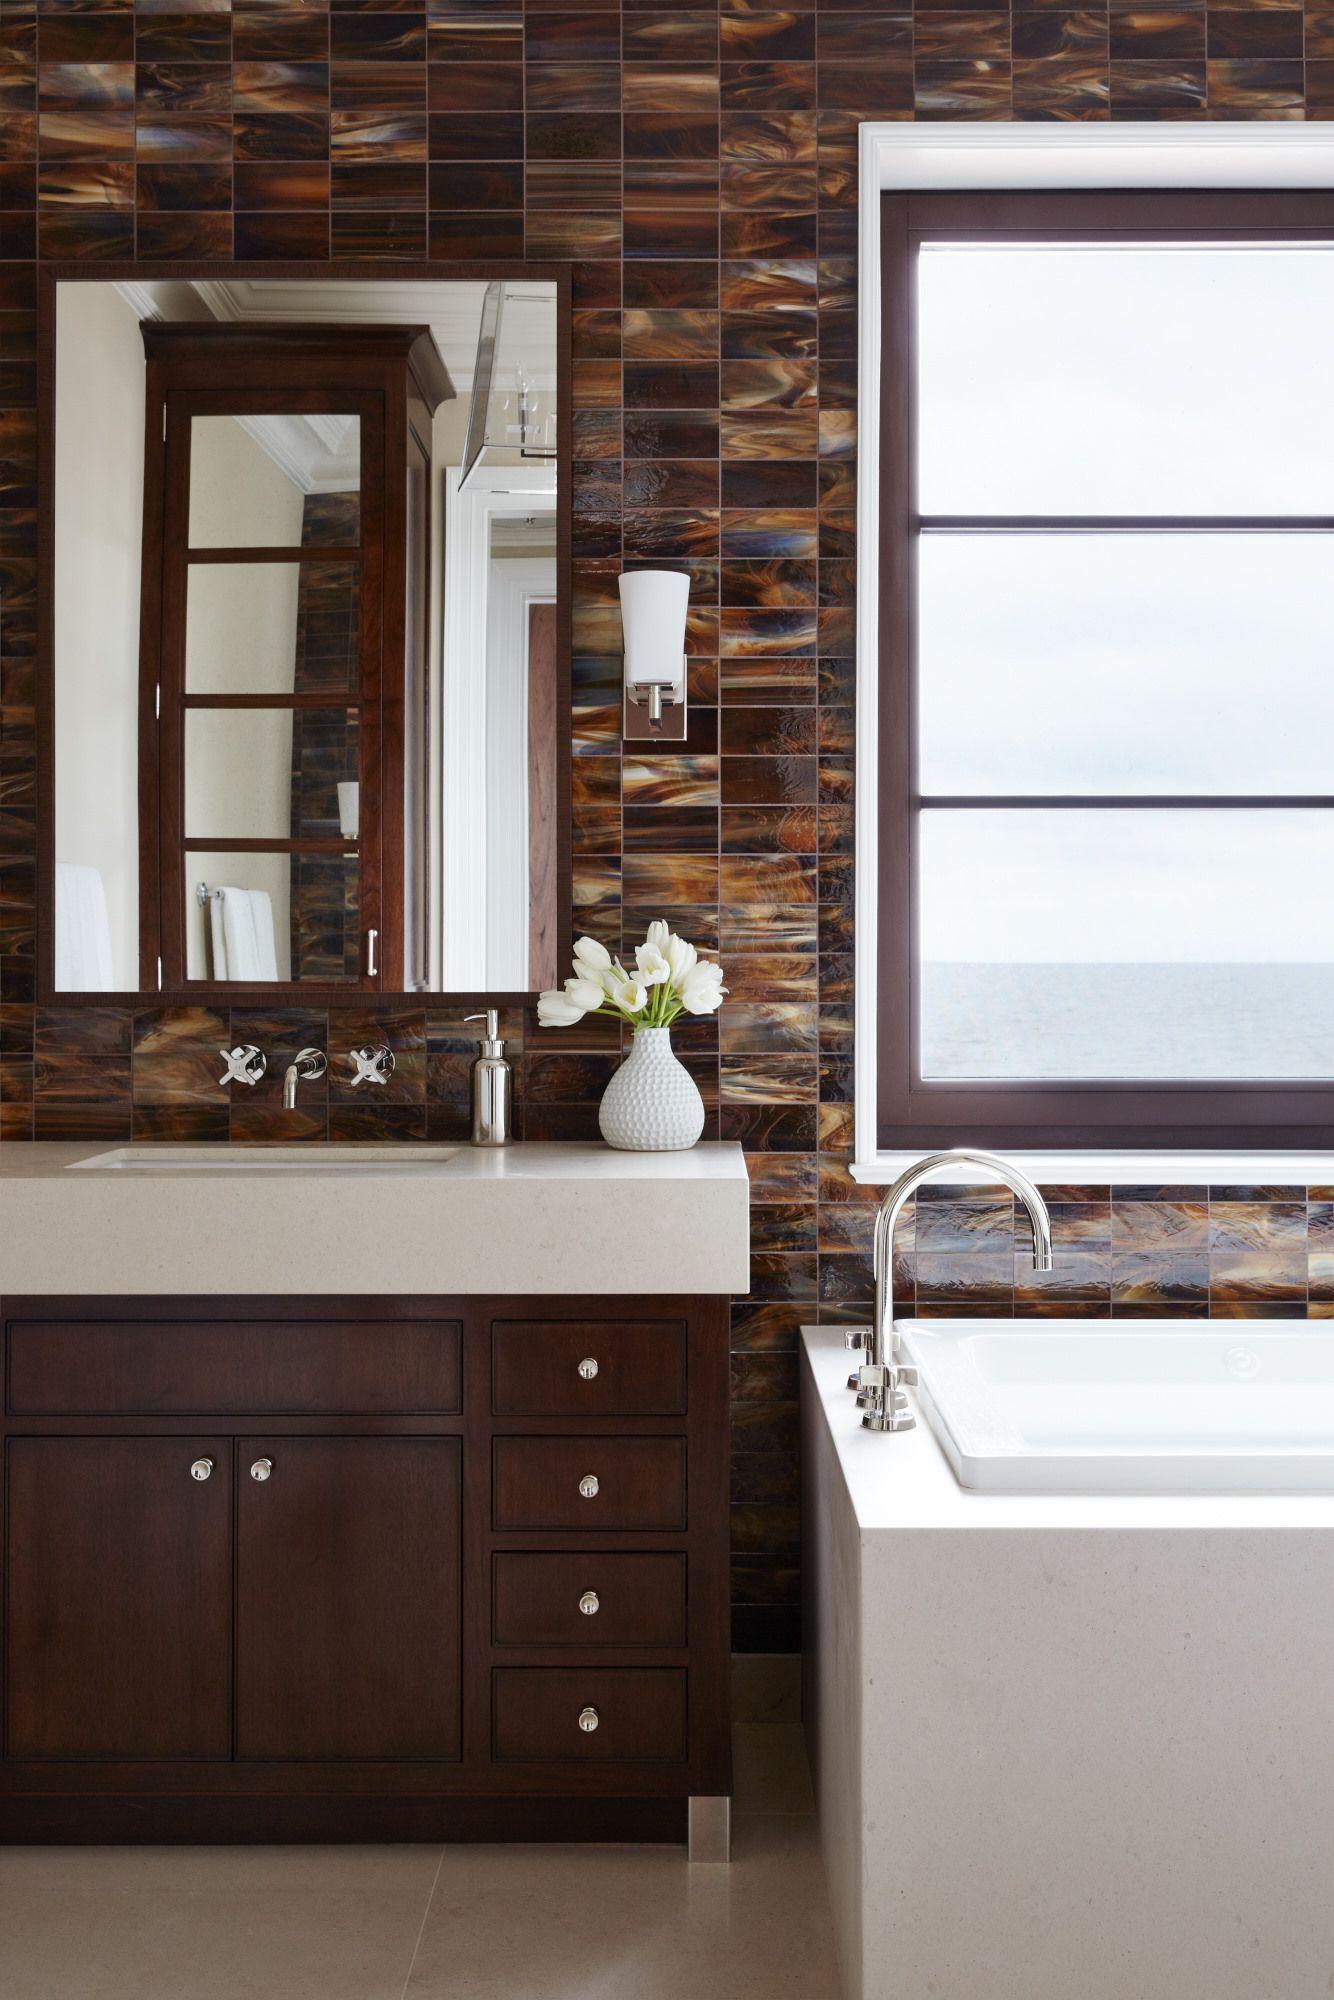 33 Bathroom Tile Design Ideas - Unique Tiled Bathrooms on Bathroom Tile Designs  id=14826